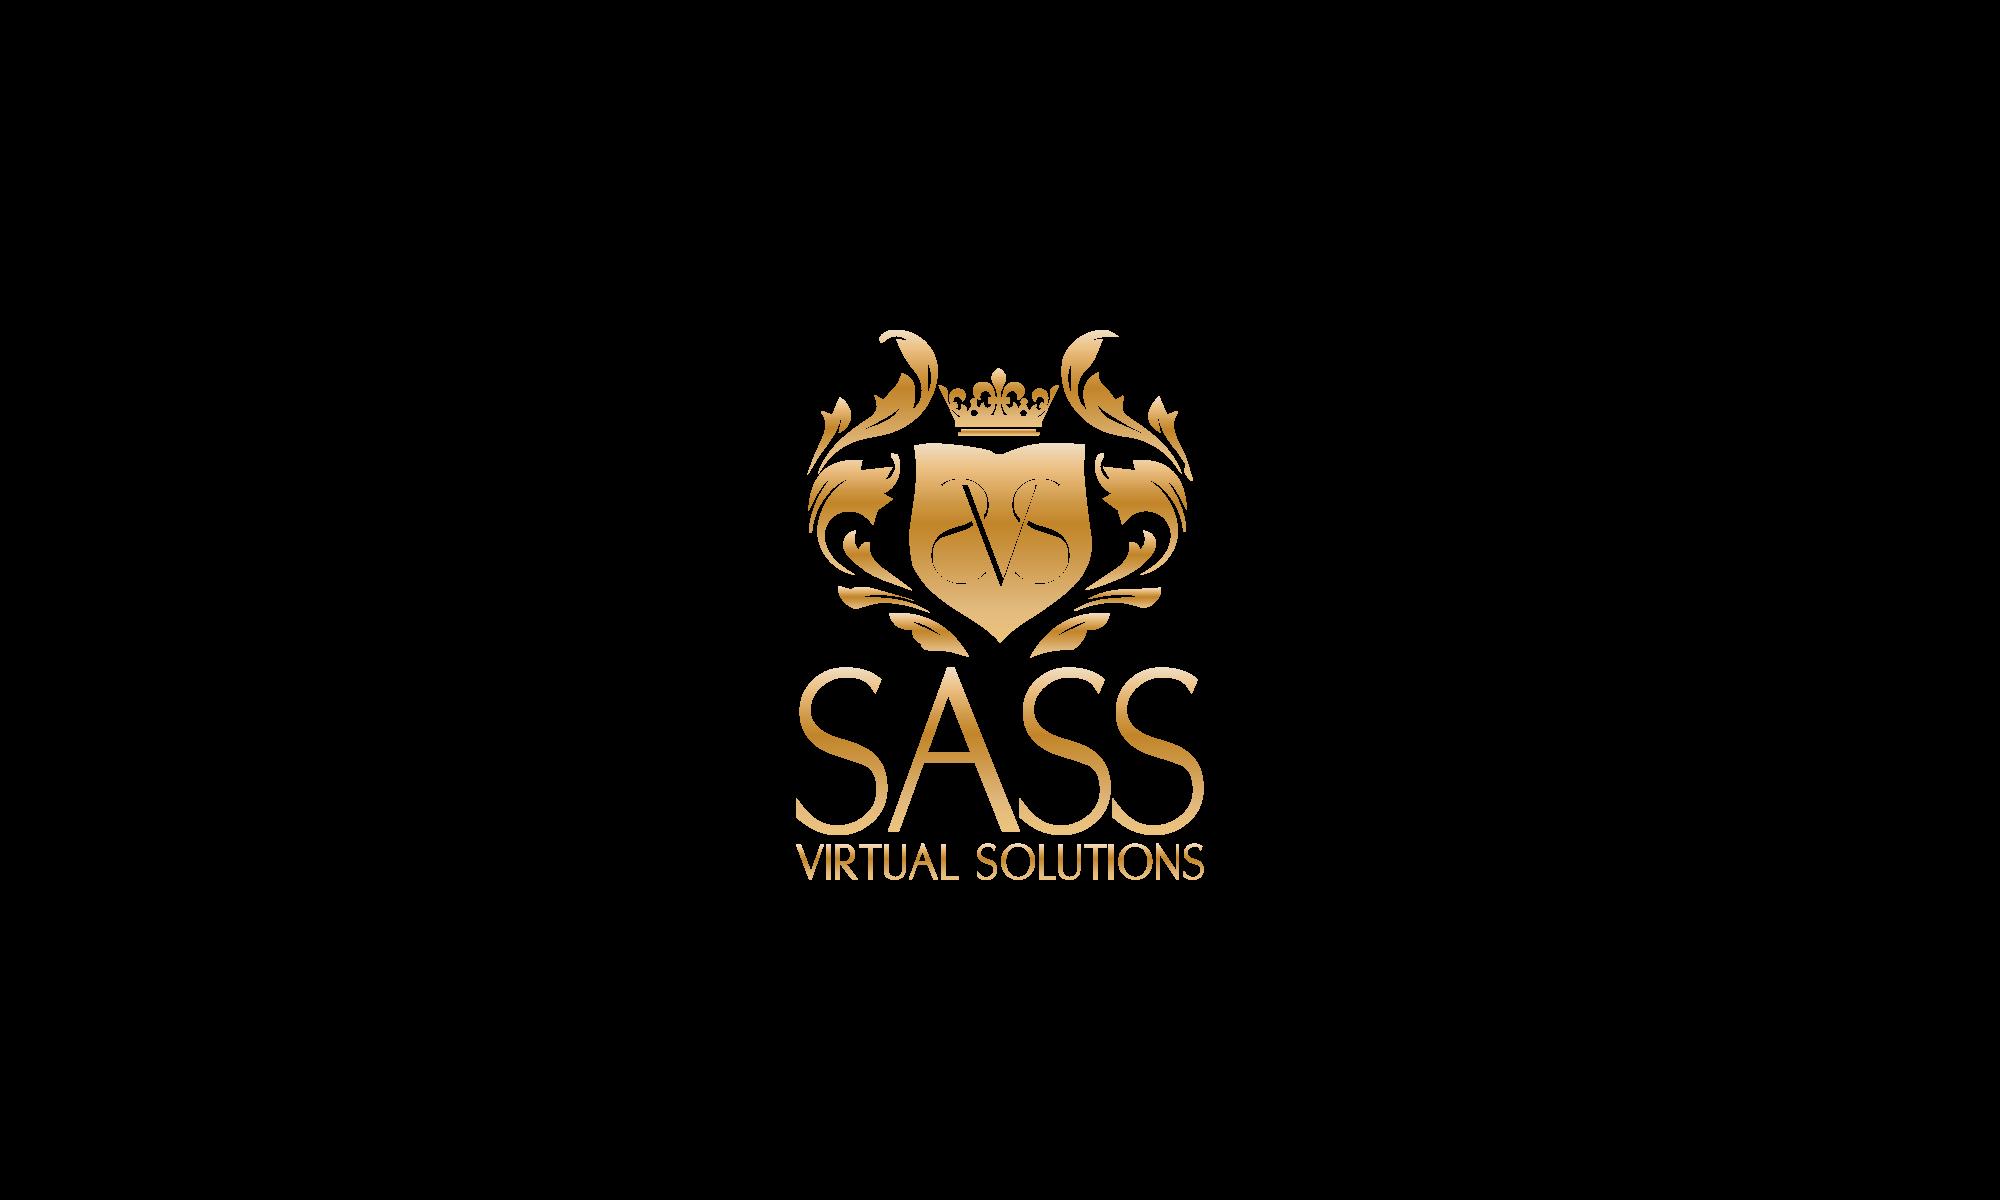 Unique and Clean Logo Design for your venture